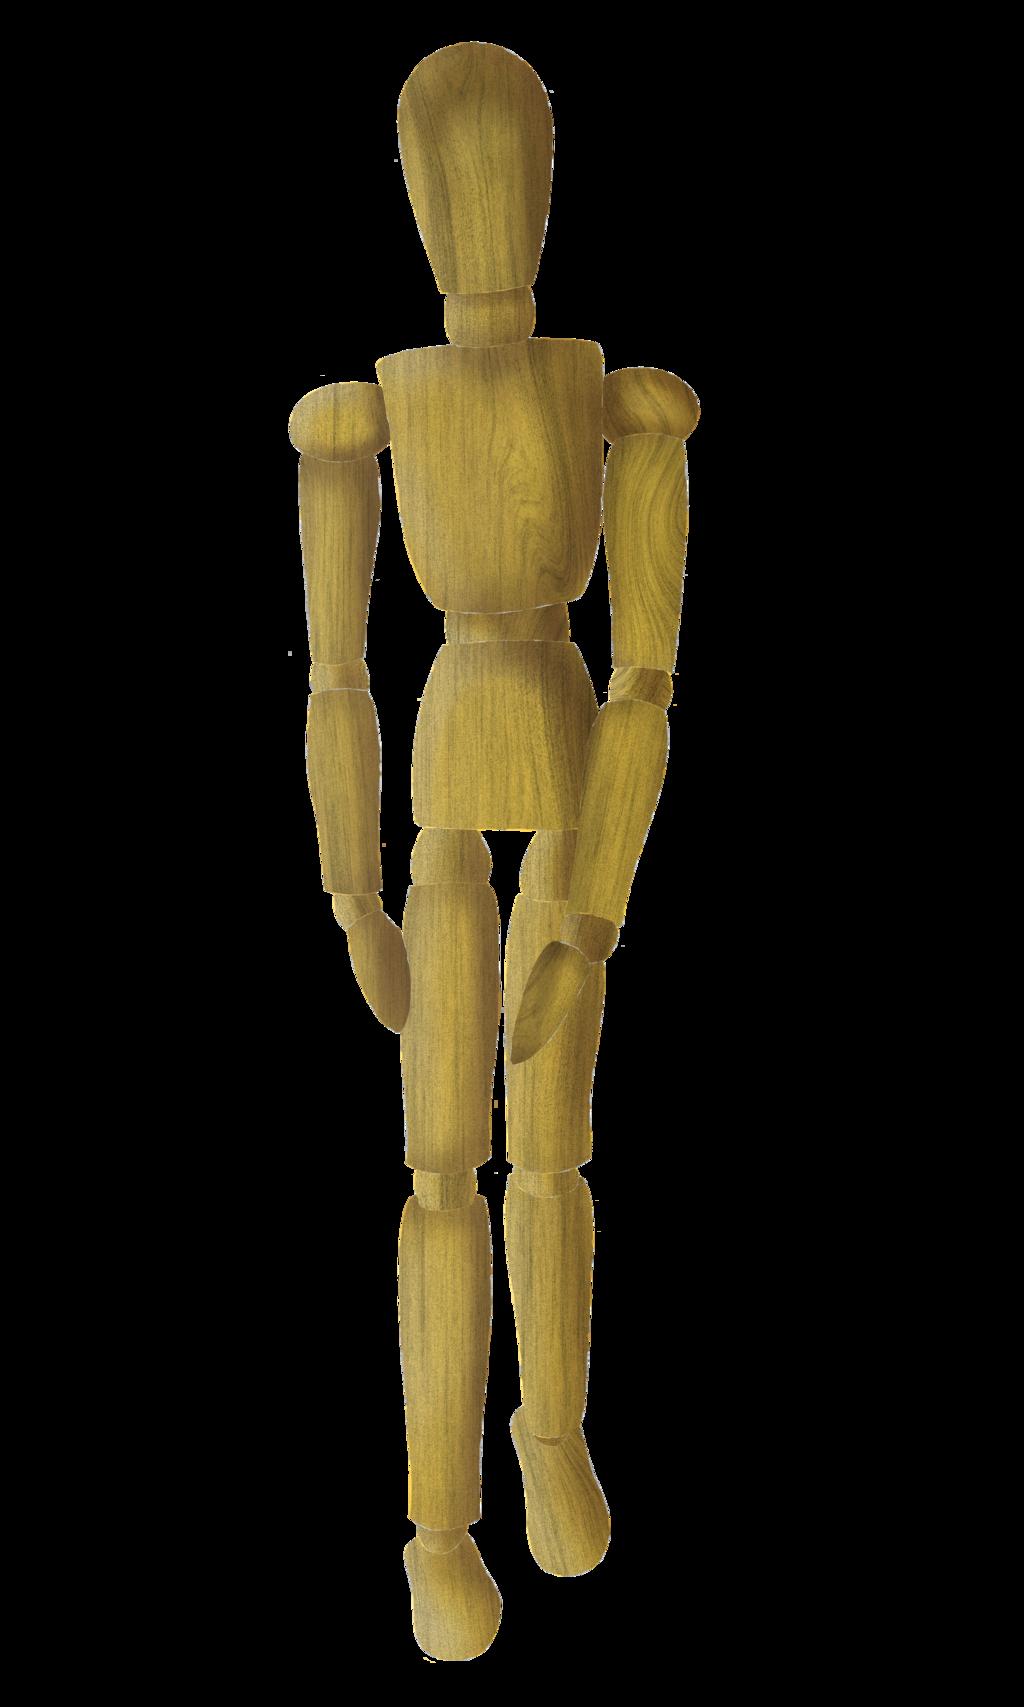 clip Wooden Mannequin by jacklapworth on DeviantArt